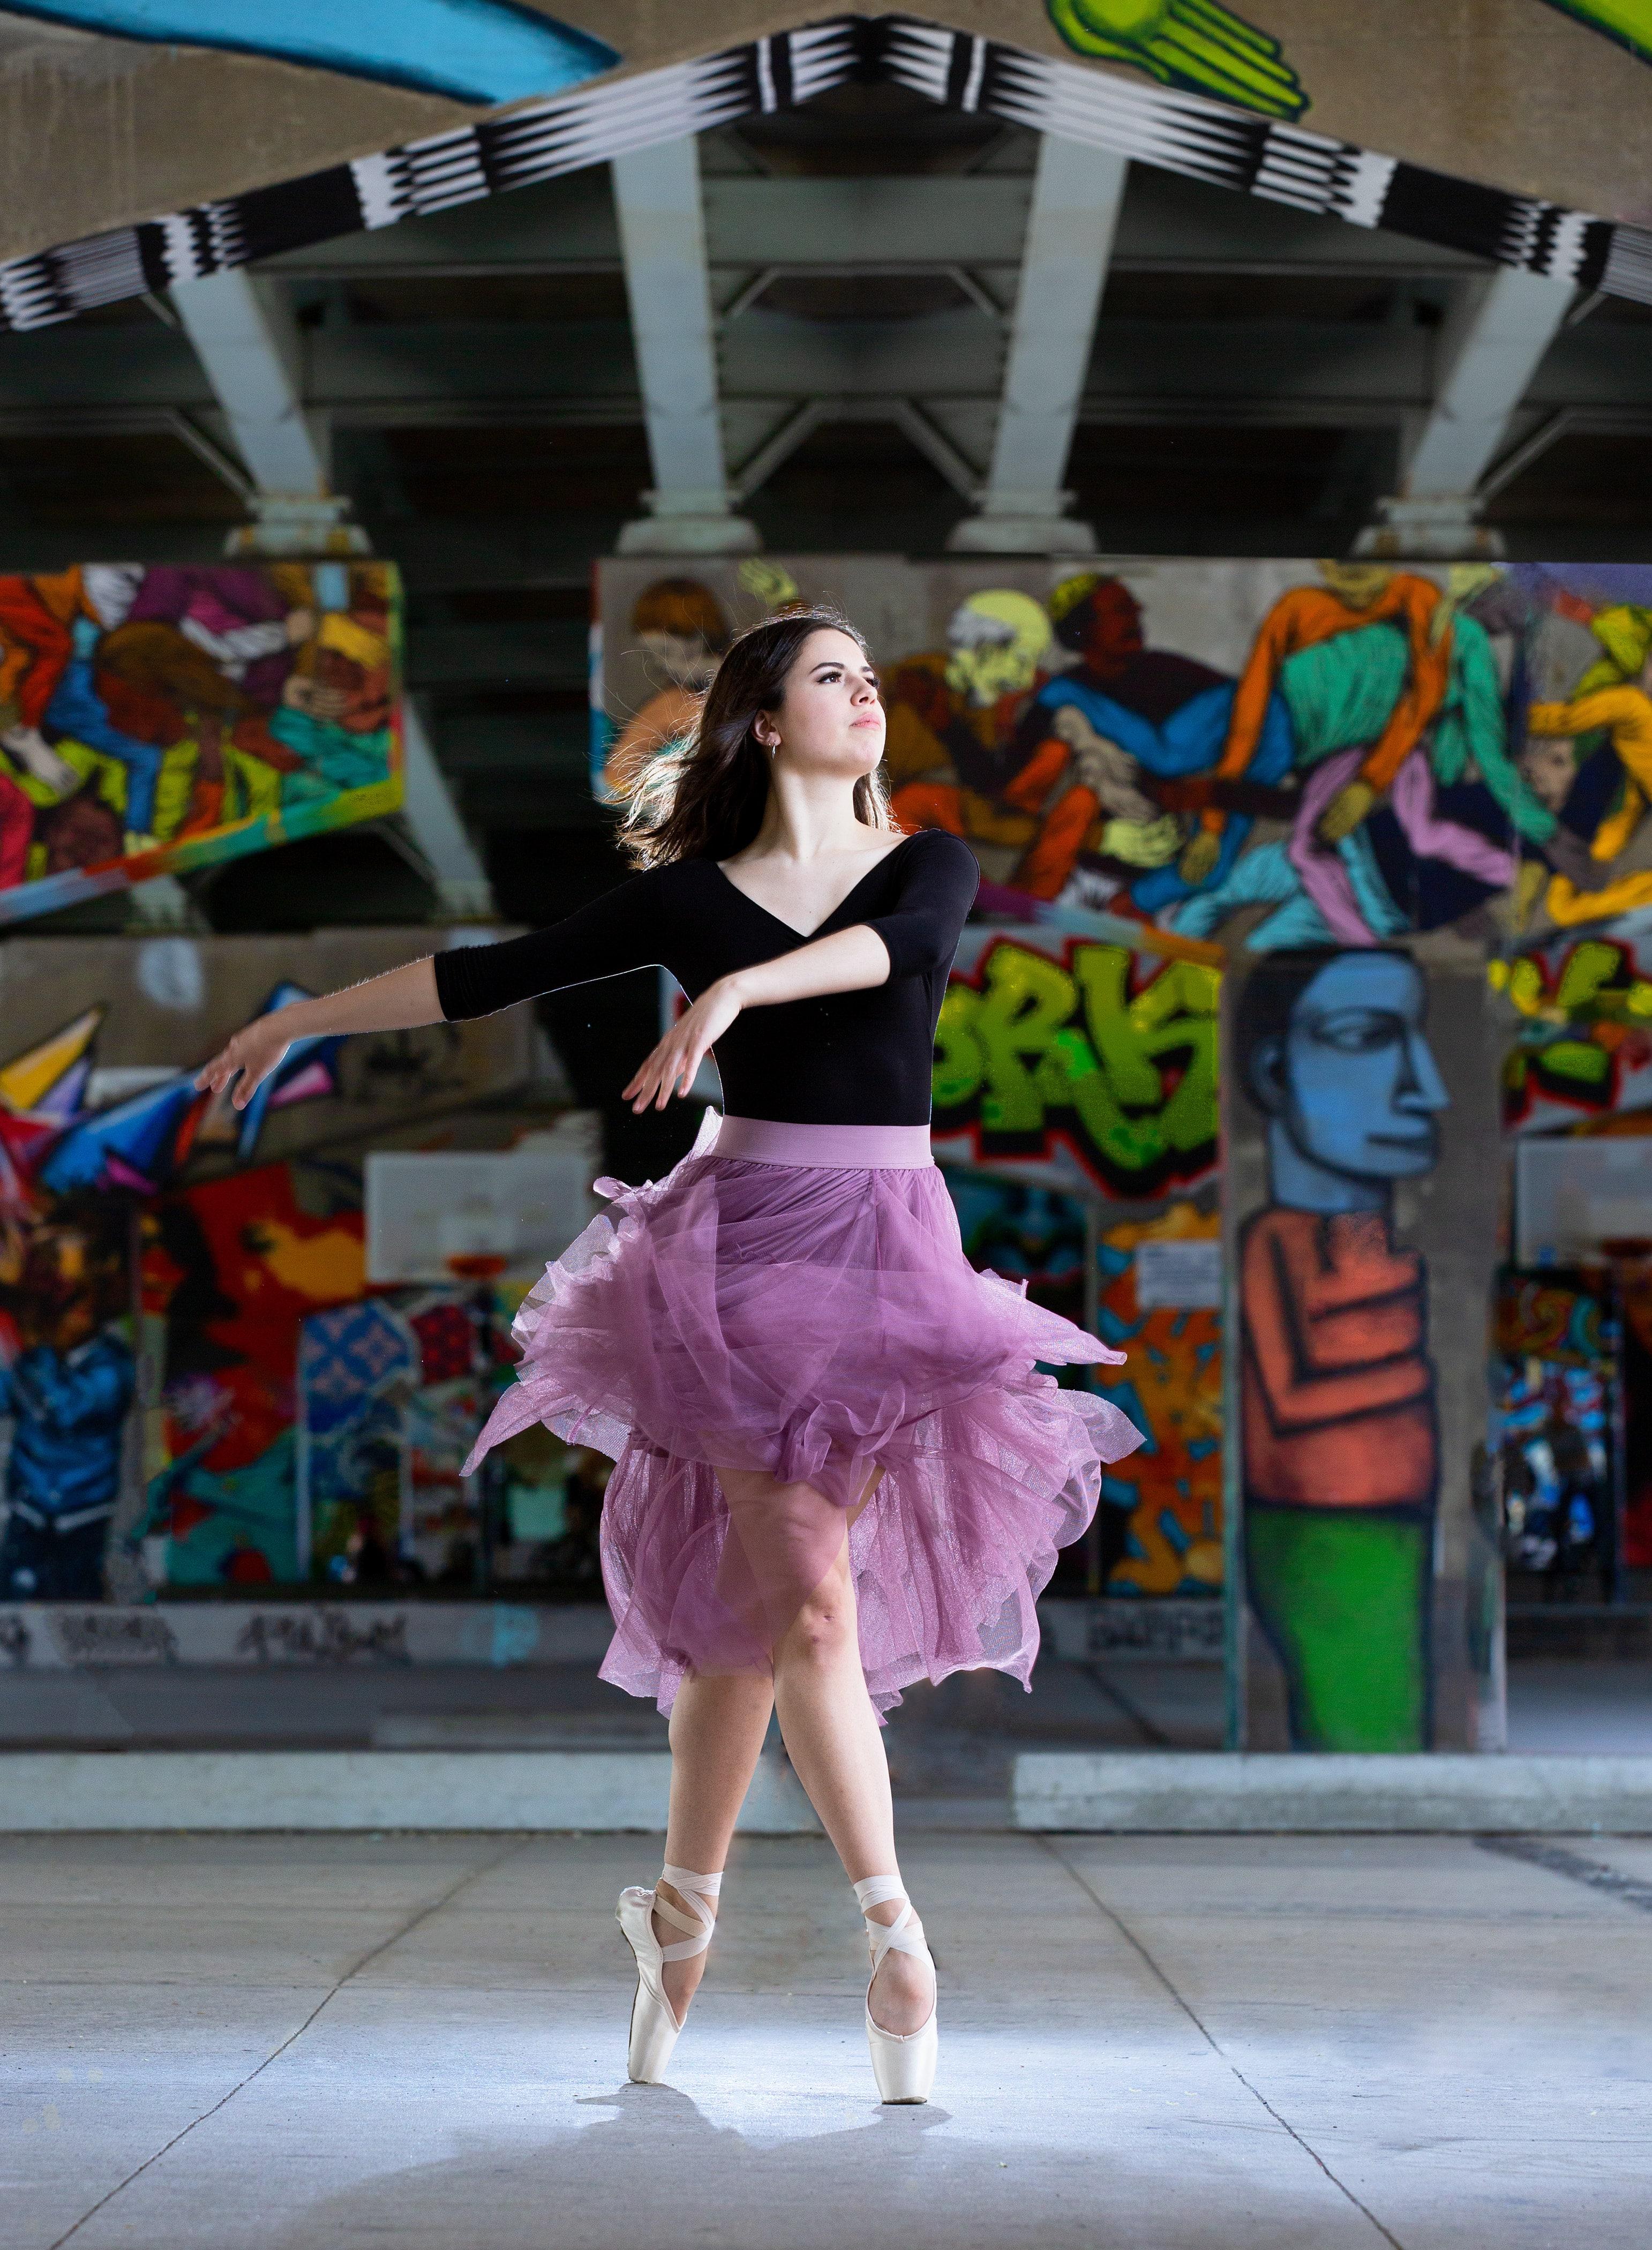 P105 Dance Performance – Class of 2021, Astrud Robichaud, George Brown Dance, Ballet Jörgen